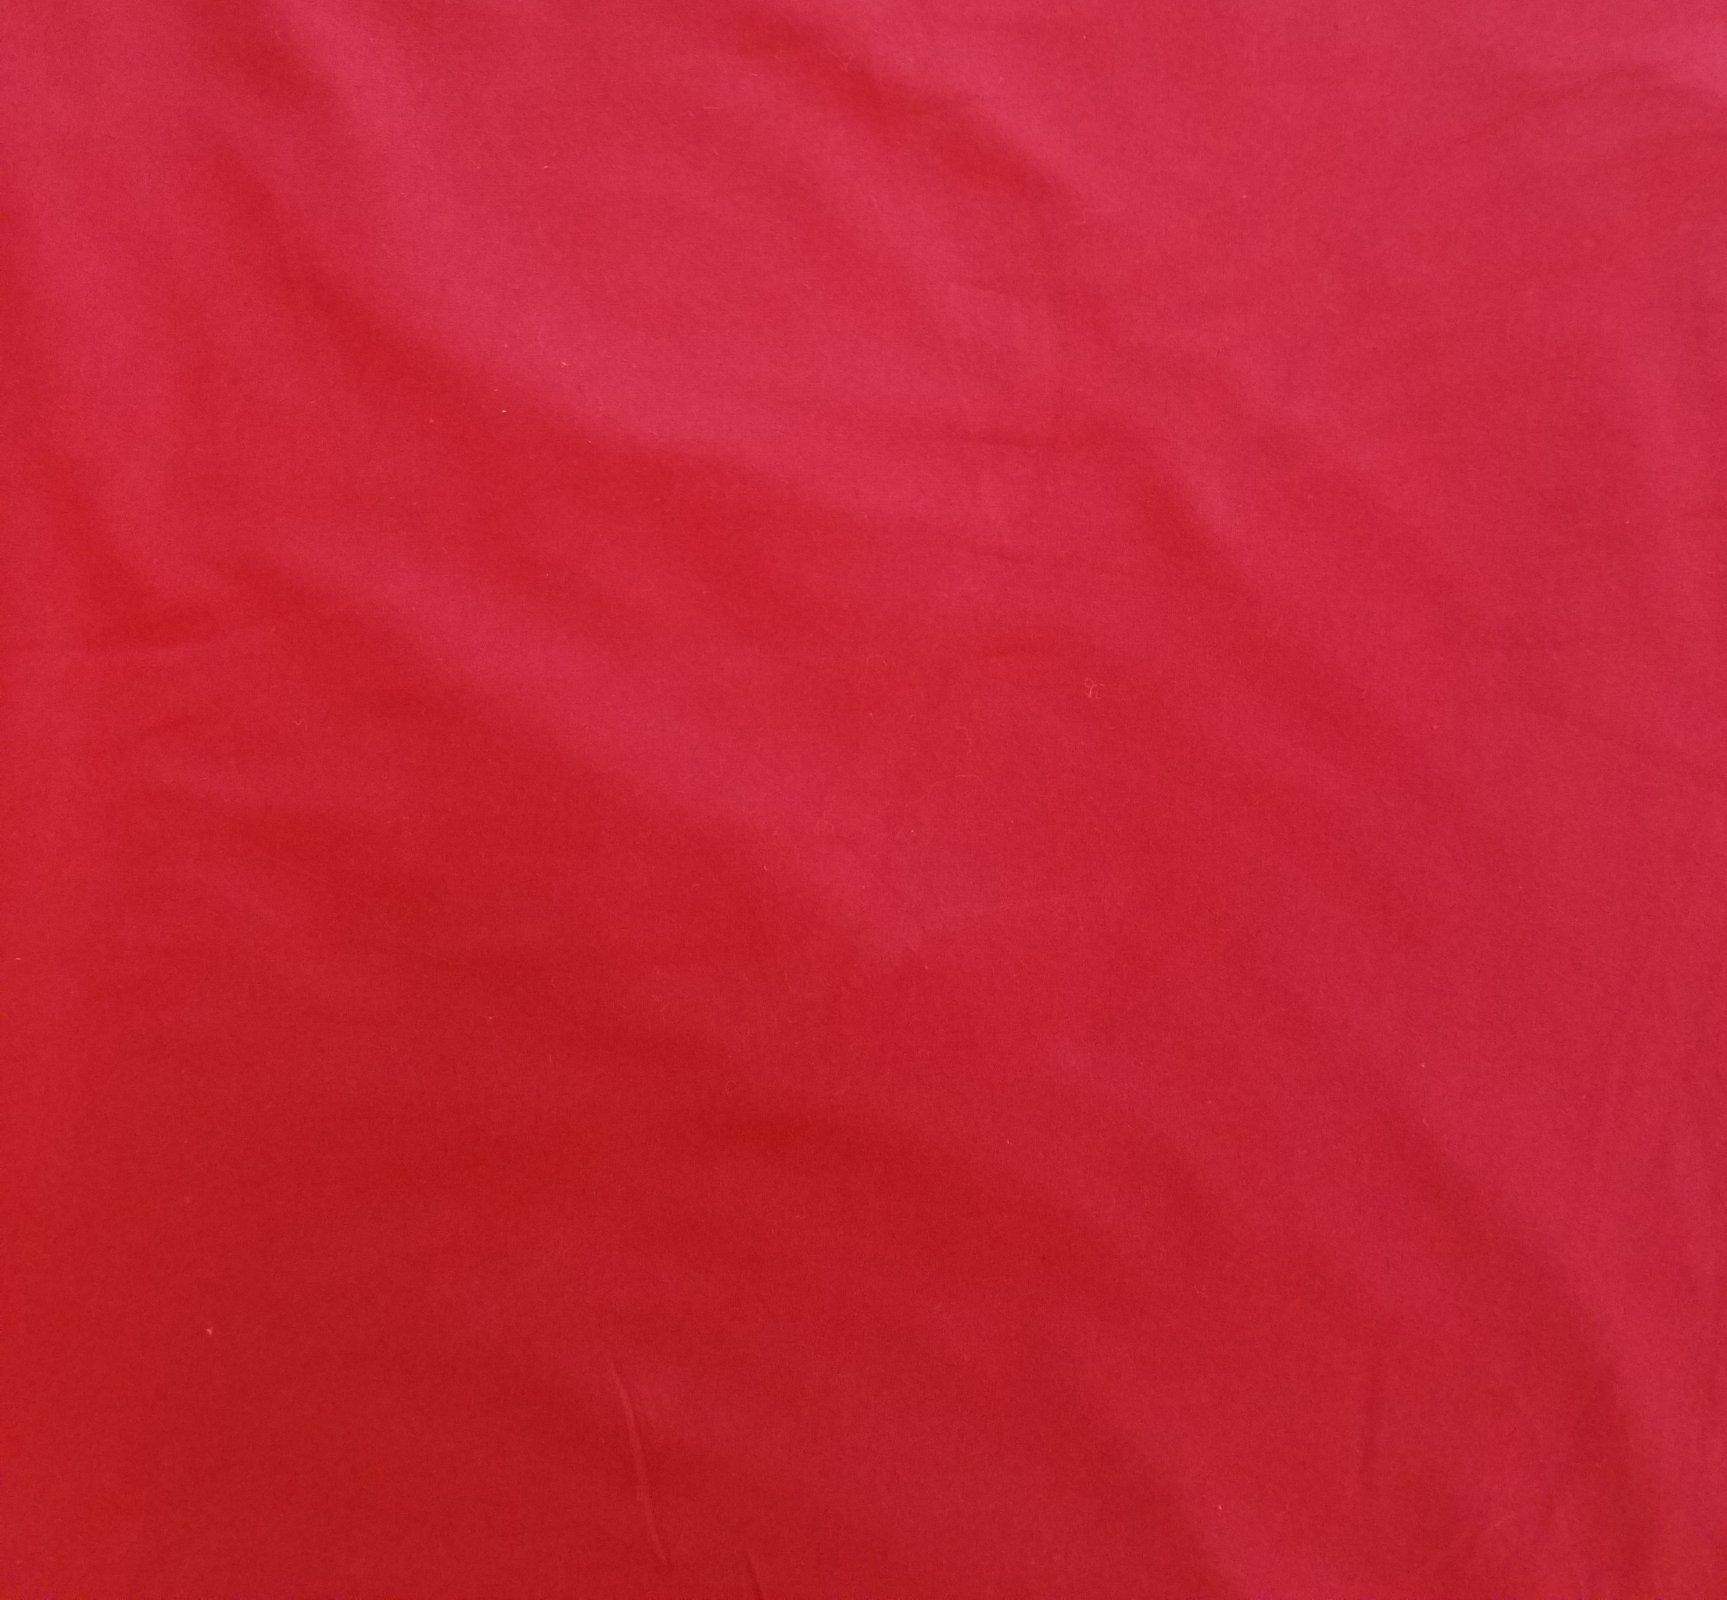 True Red - Cotton/Spandex Knit